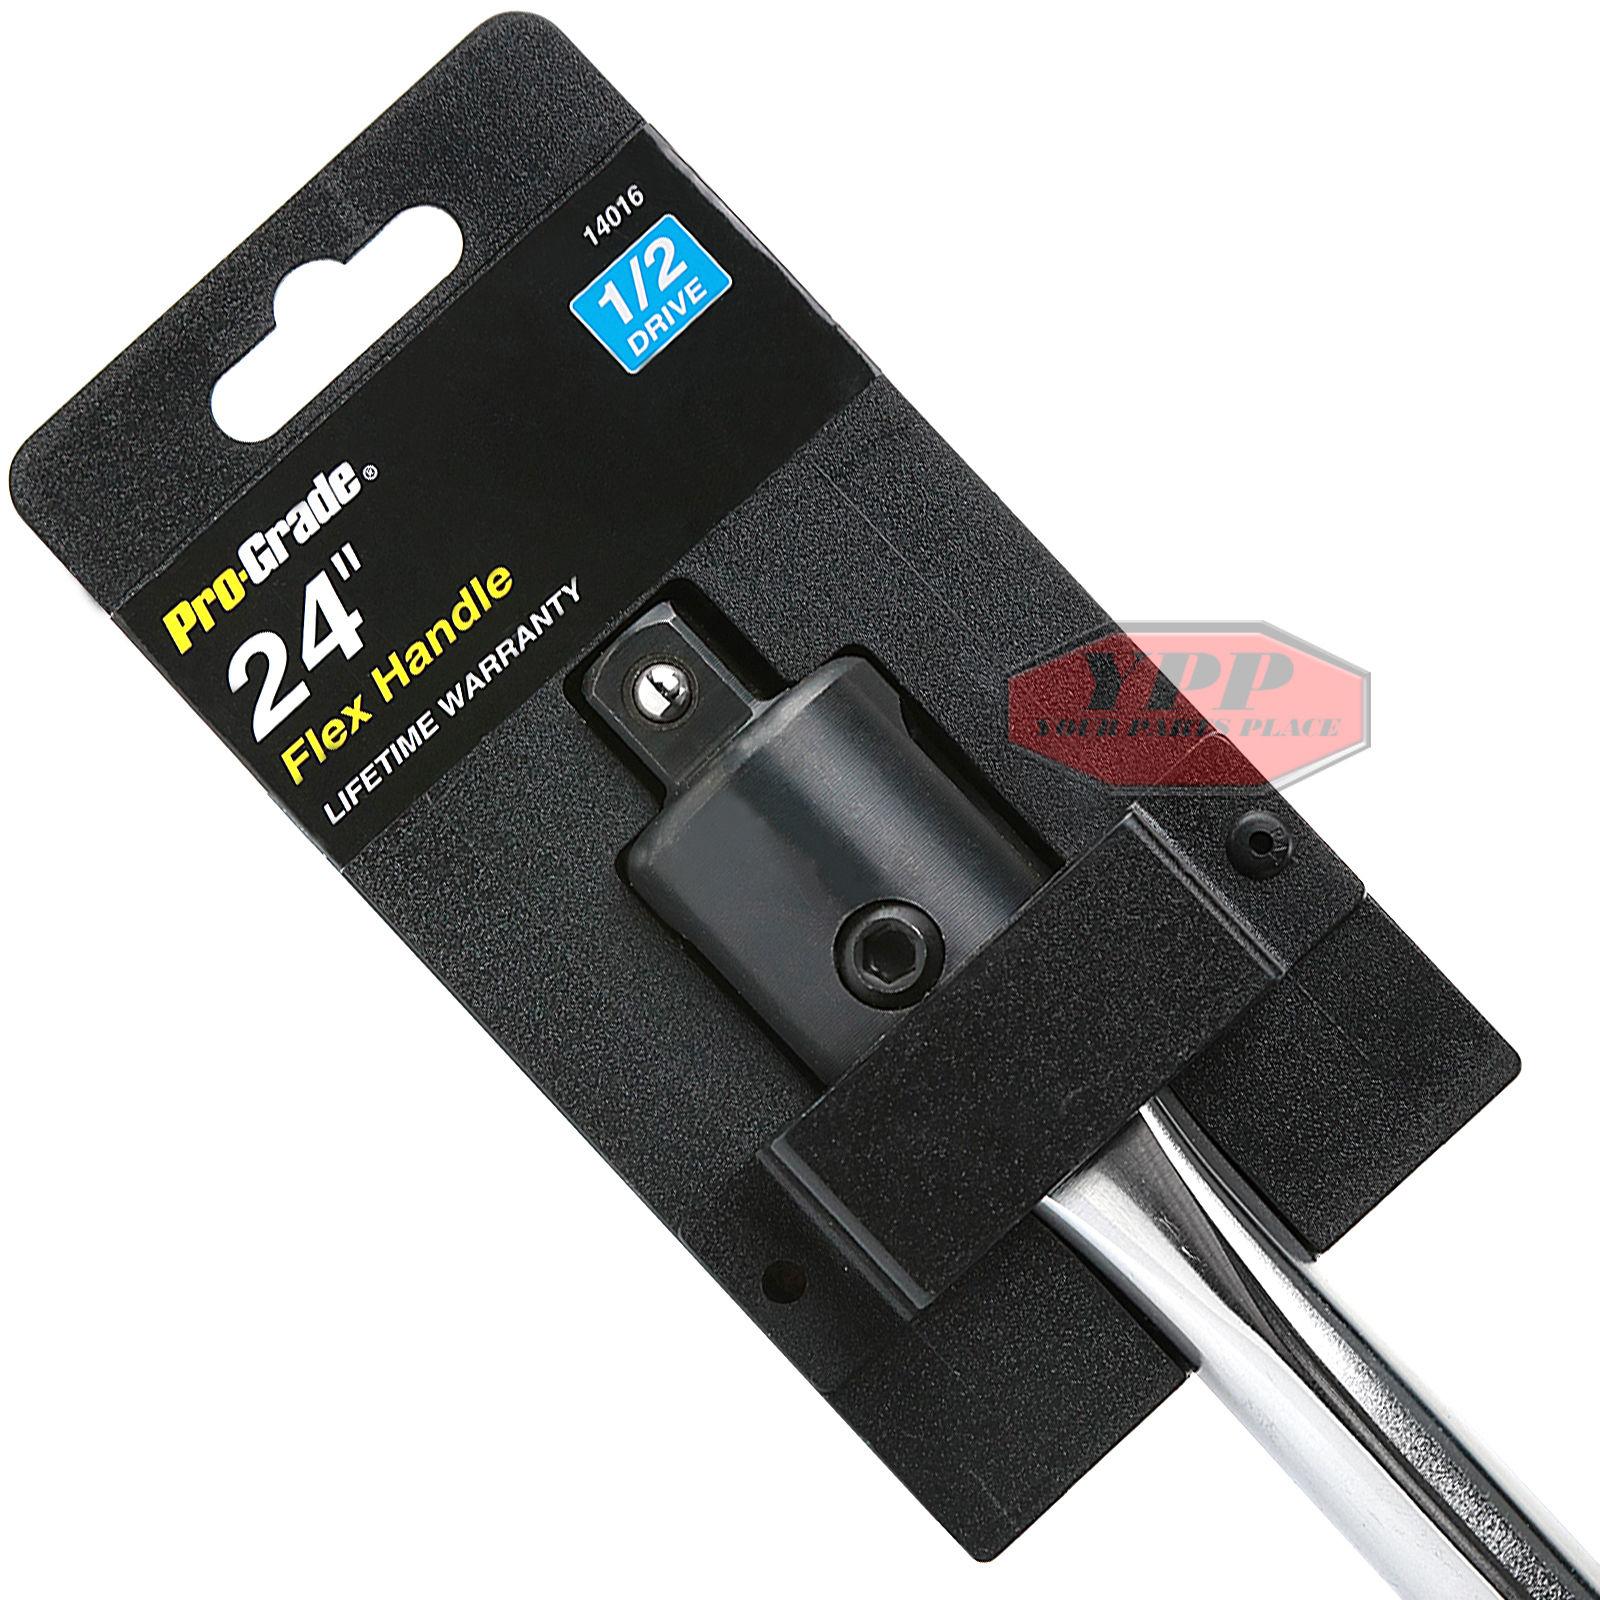 24 Quot 1 2 Quot Drive Breaker Bar Flex Handle Socket Wrench Heavy